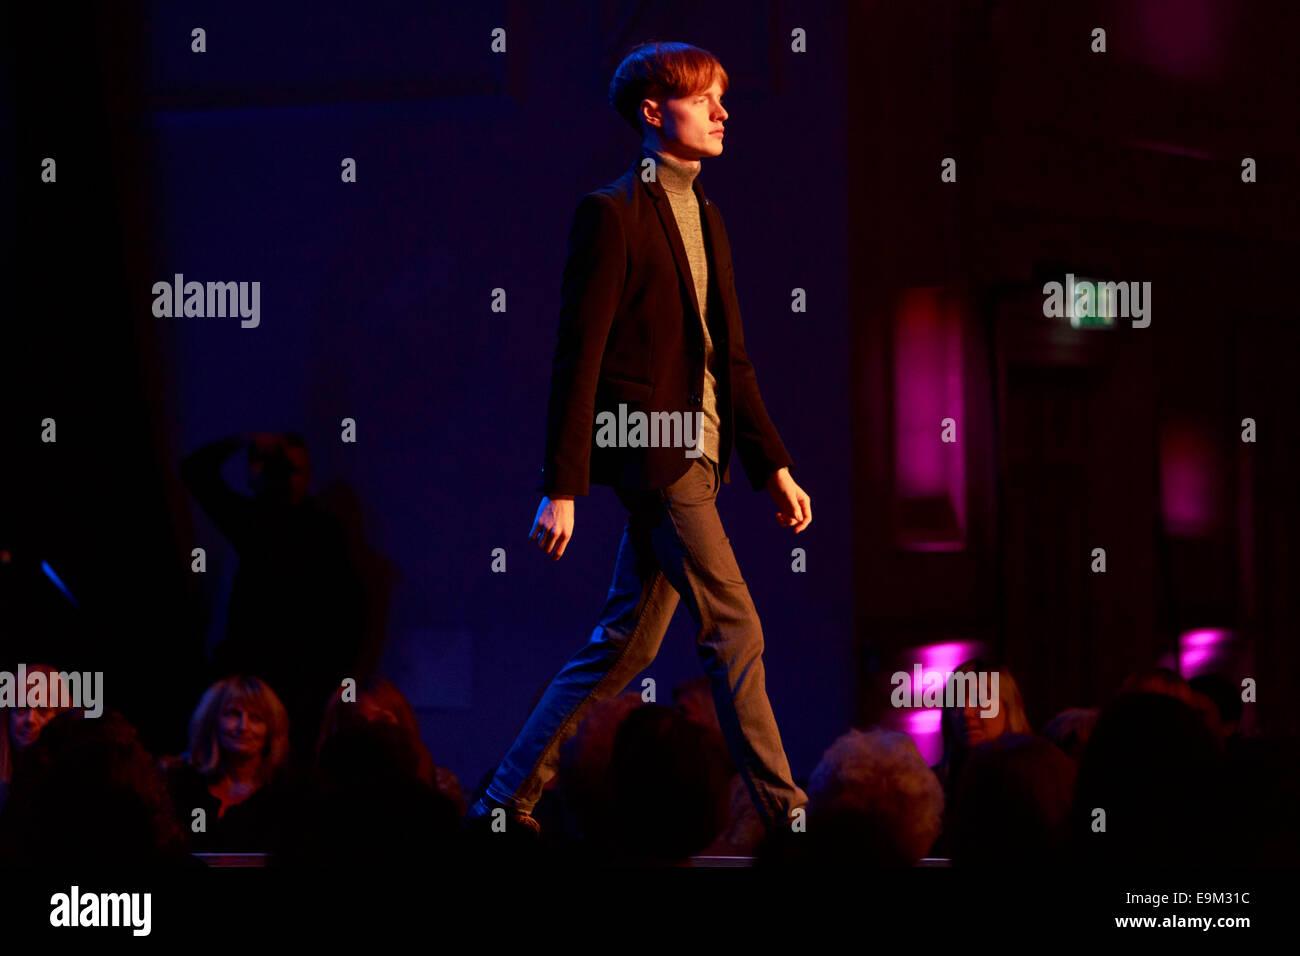 Edinburgh, Scotland, UK. 29th Oct, 2014. St James Shopping Centre Edinburgh fashion Show season Autumn and Winter. - Stock Image